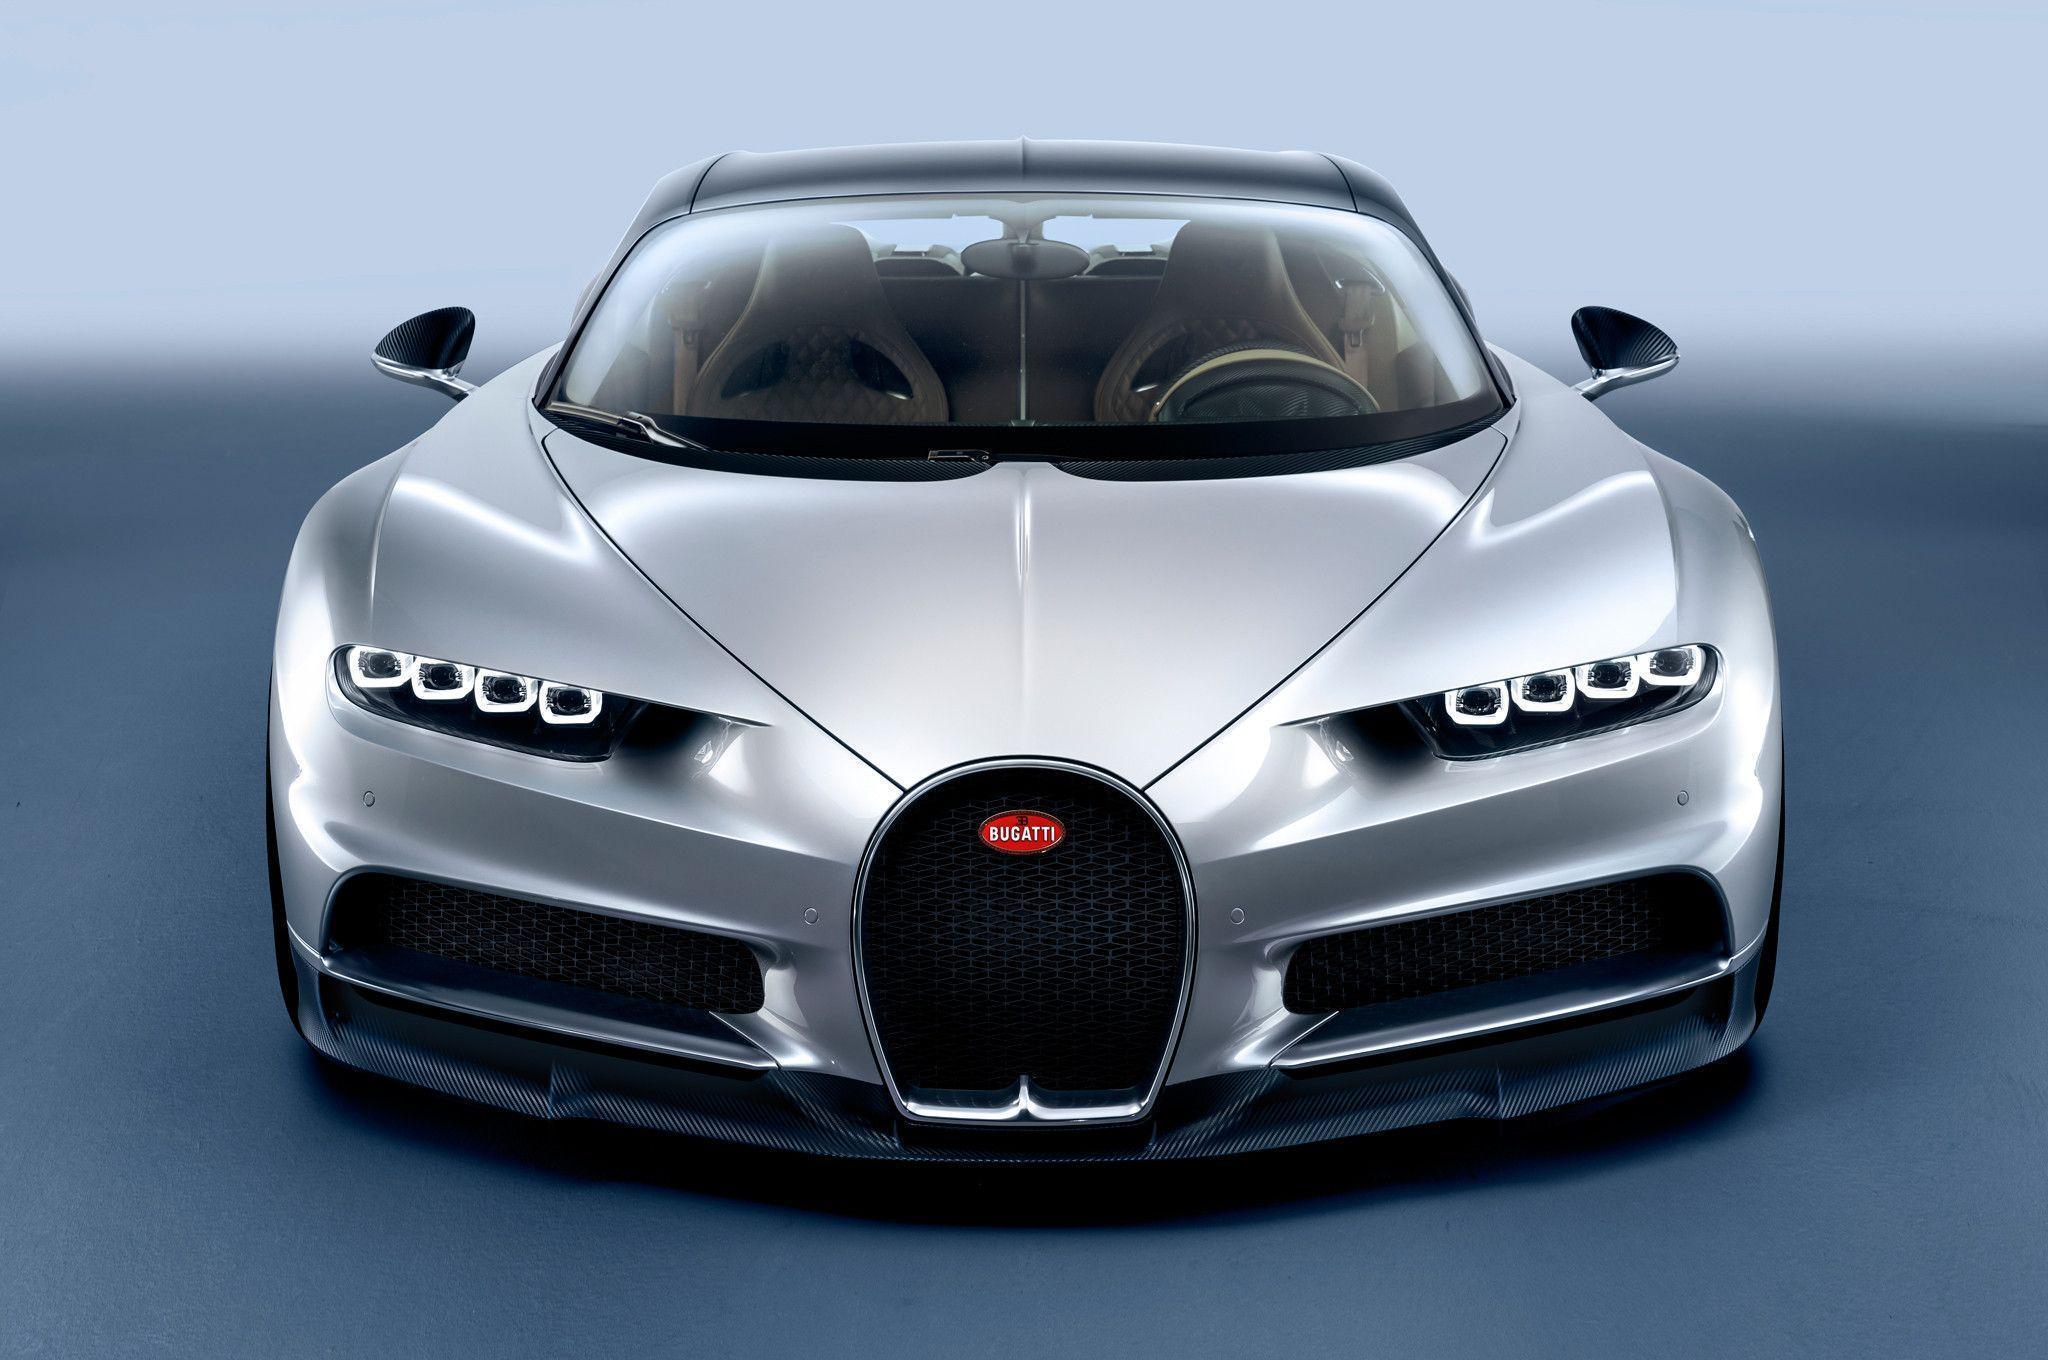 Bugatti Chiron Wallpapers - Wallpaper Cave